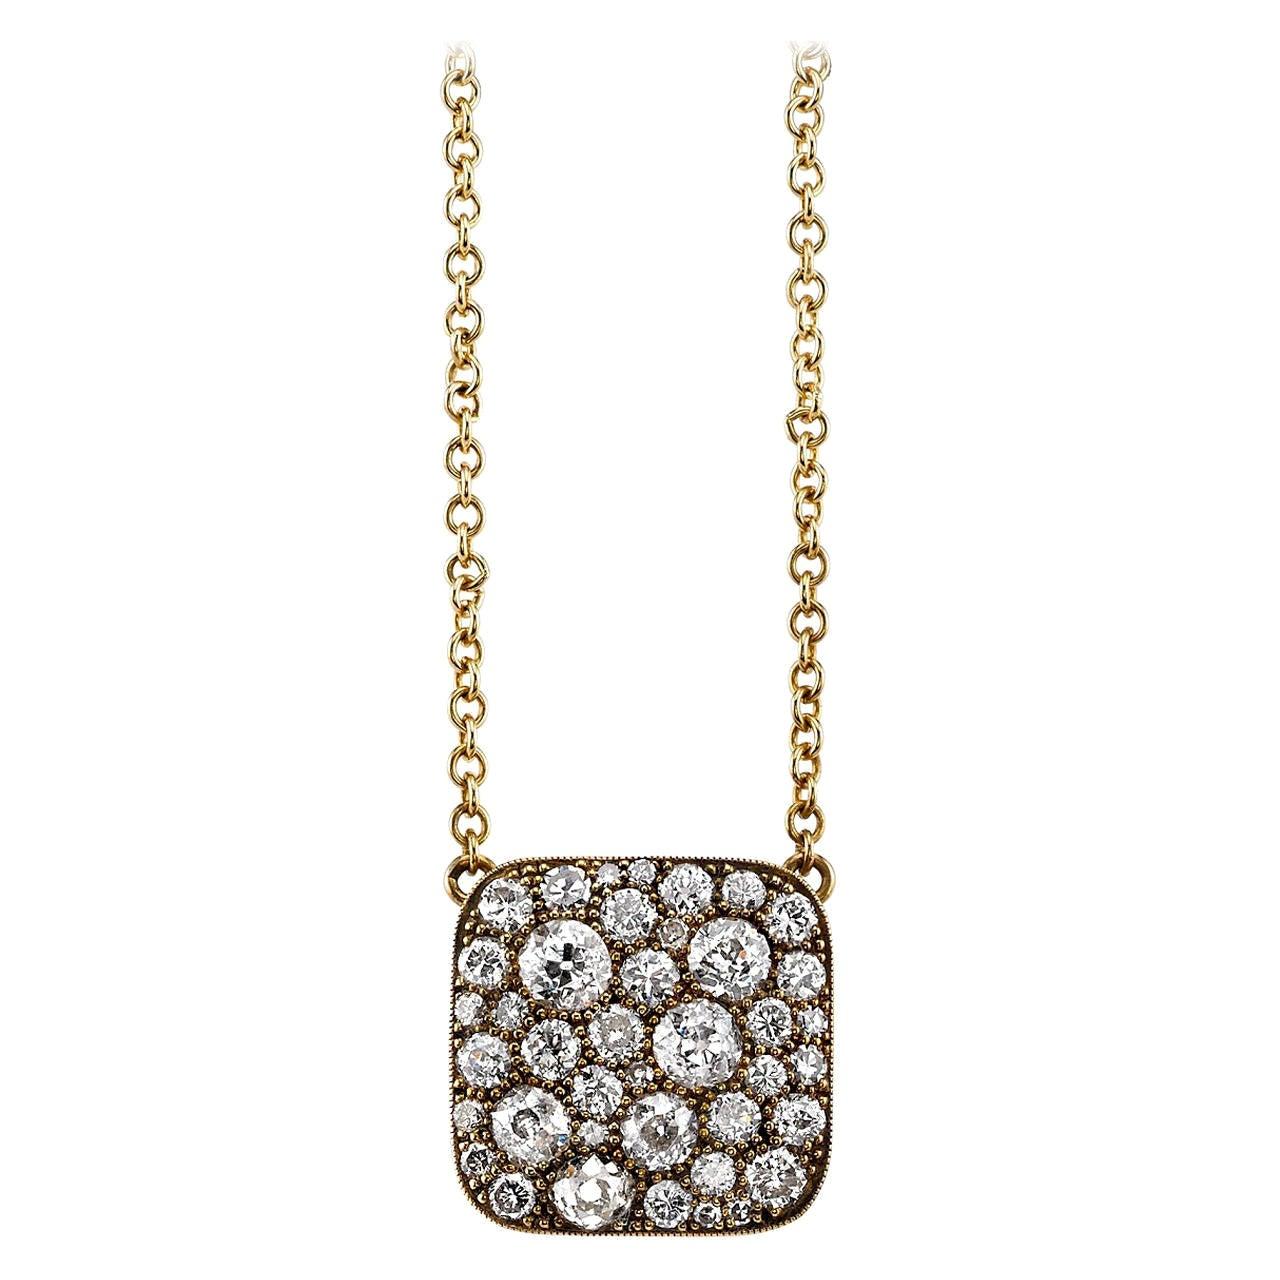 Handcrafted Yellow Gold Cobblestone Square Diamond Necklace